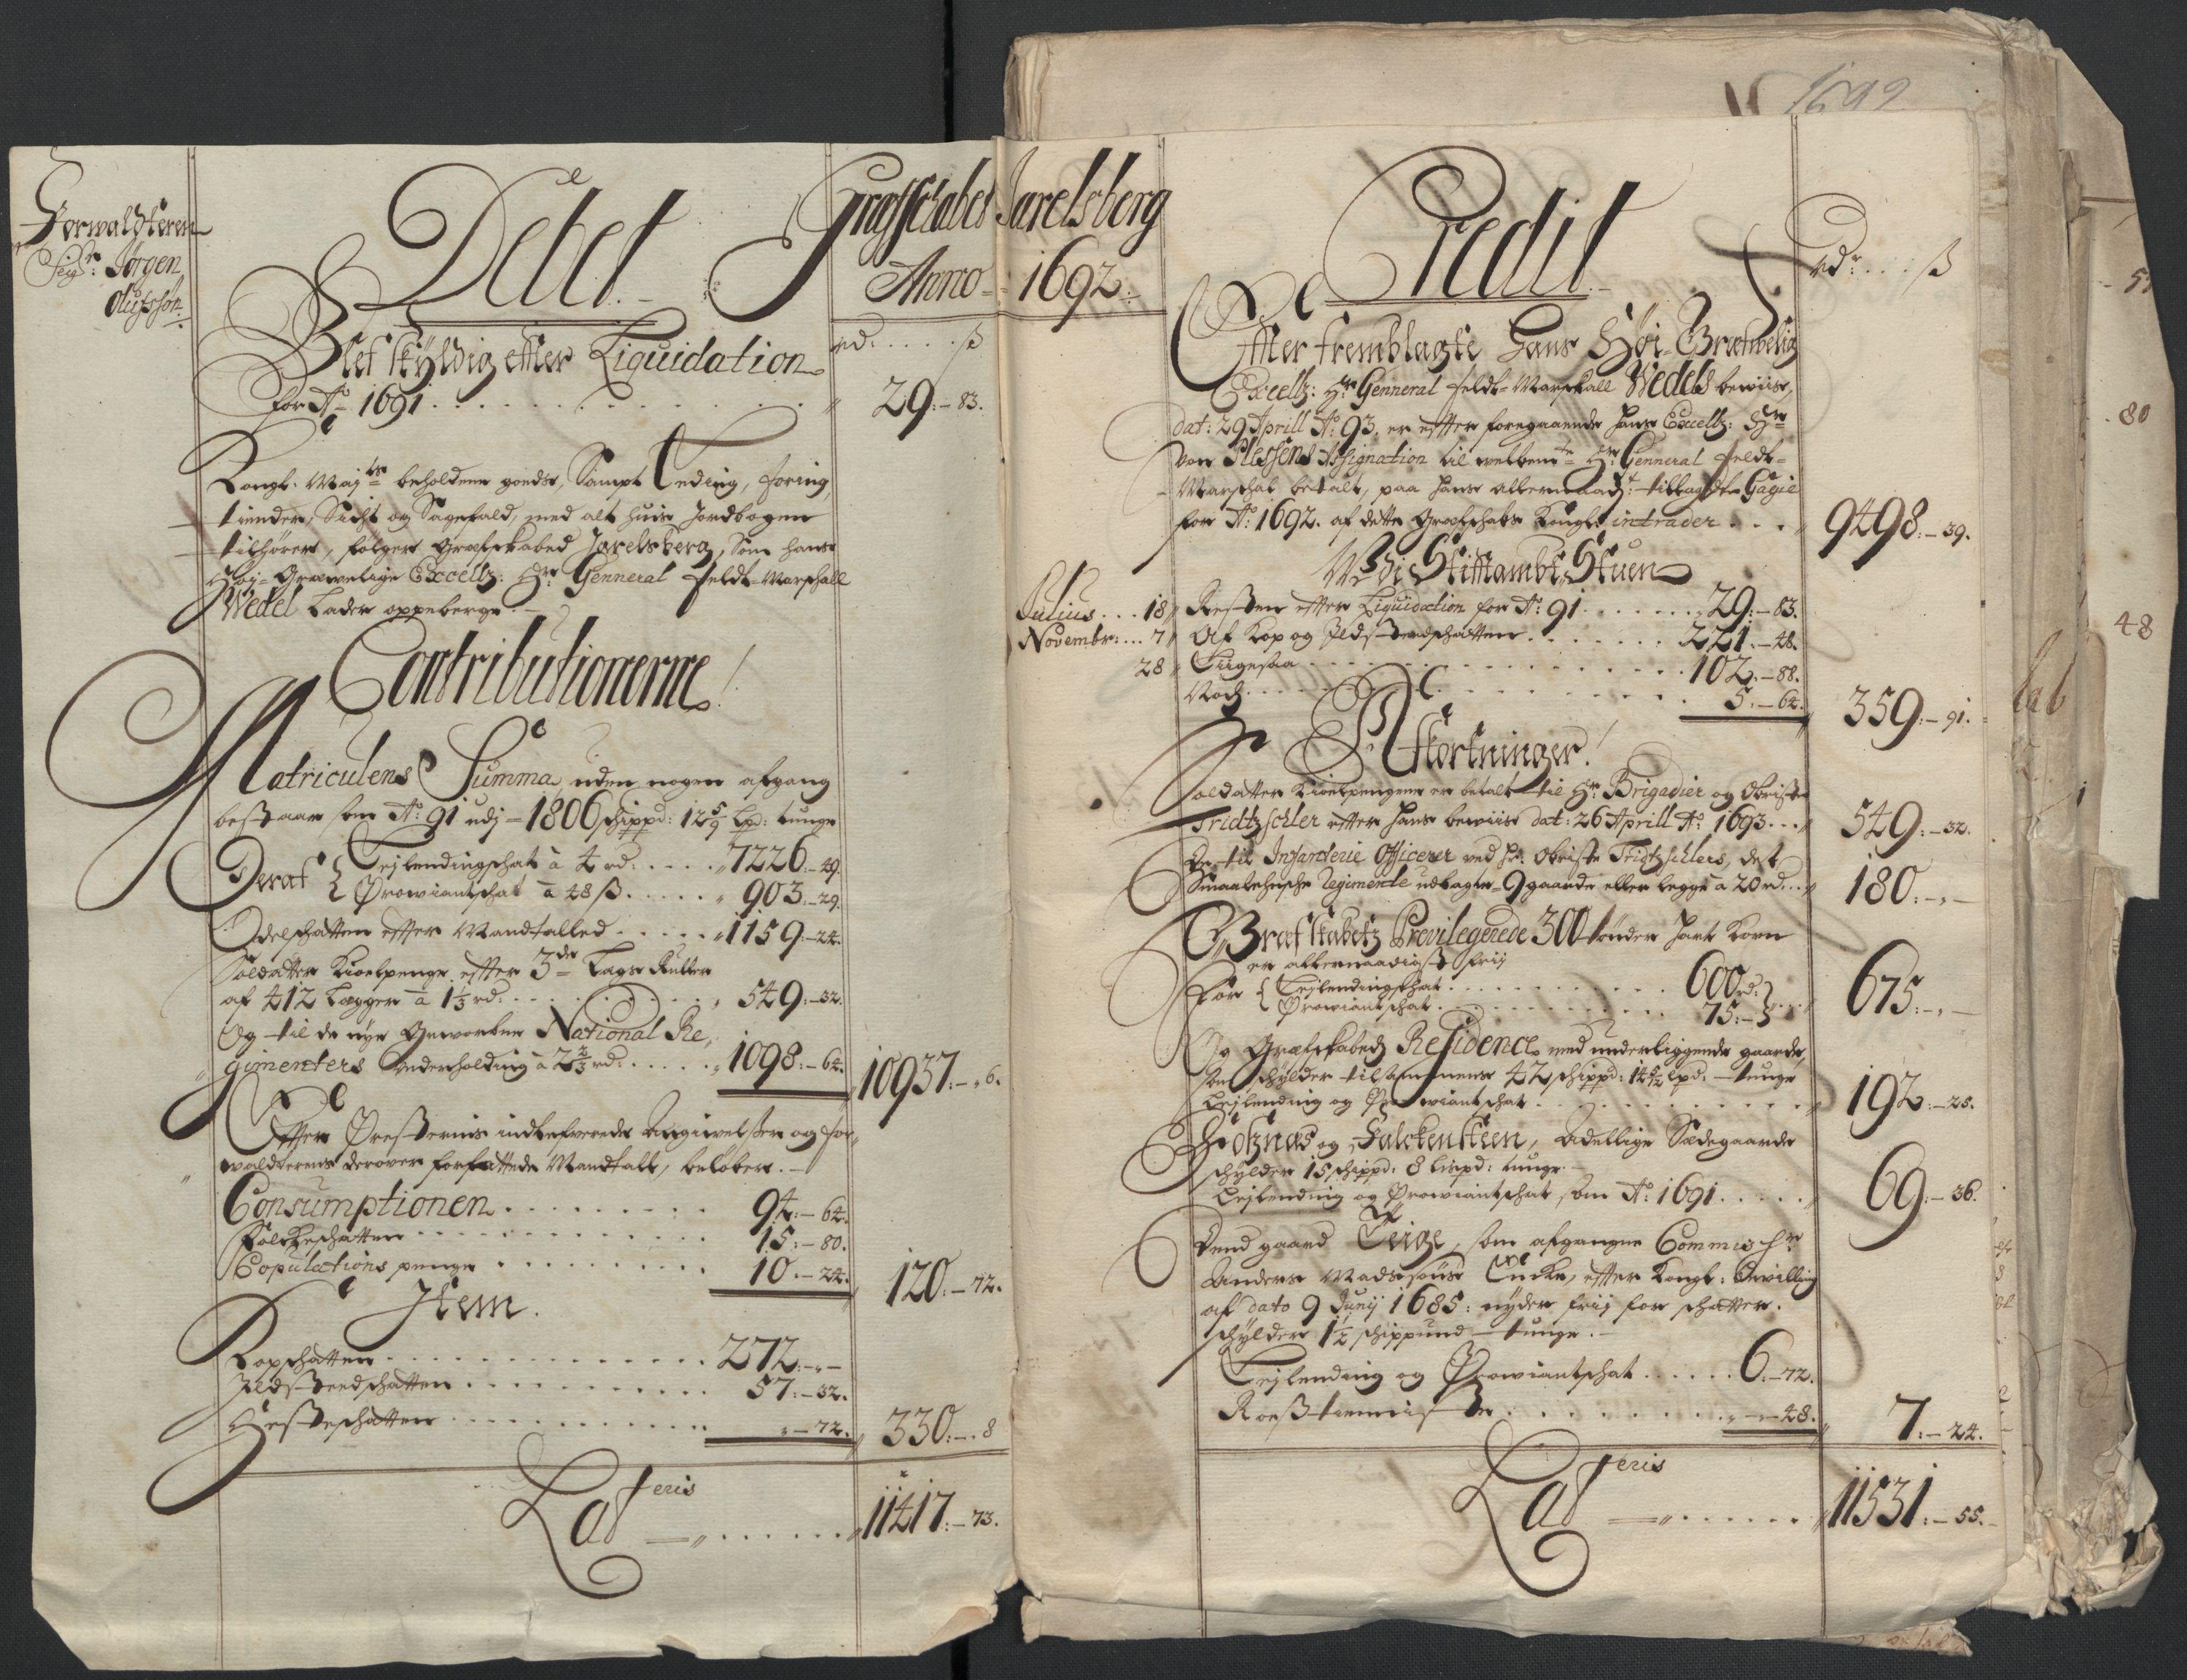 RA, Rentekammeret inntil 1814, Reviderte regnskaper, Fogderegnskap, R32/L1865: Fogderegnskap Jarlsberg grevskap, 1692, s. 14